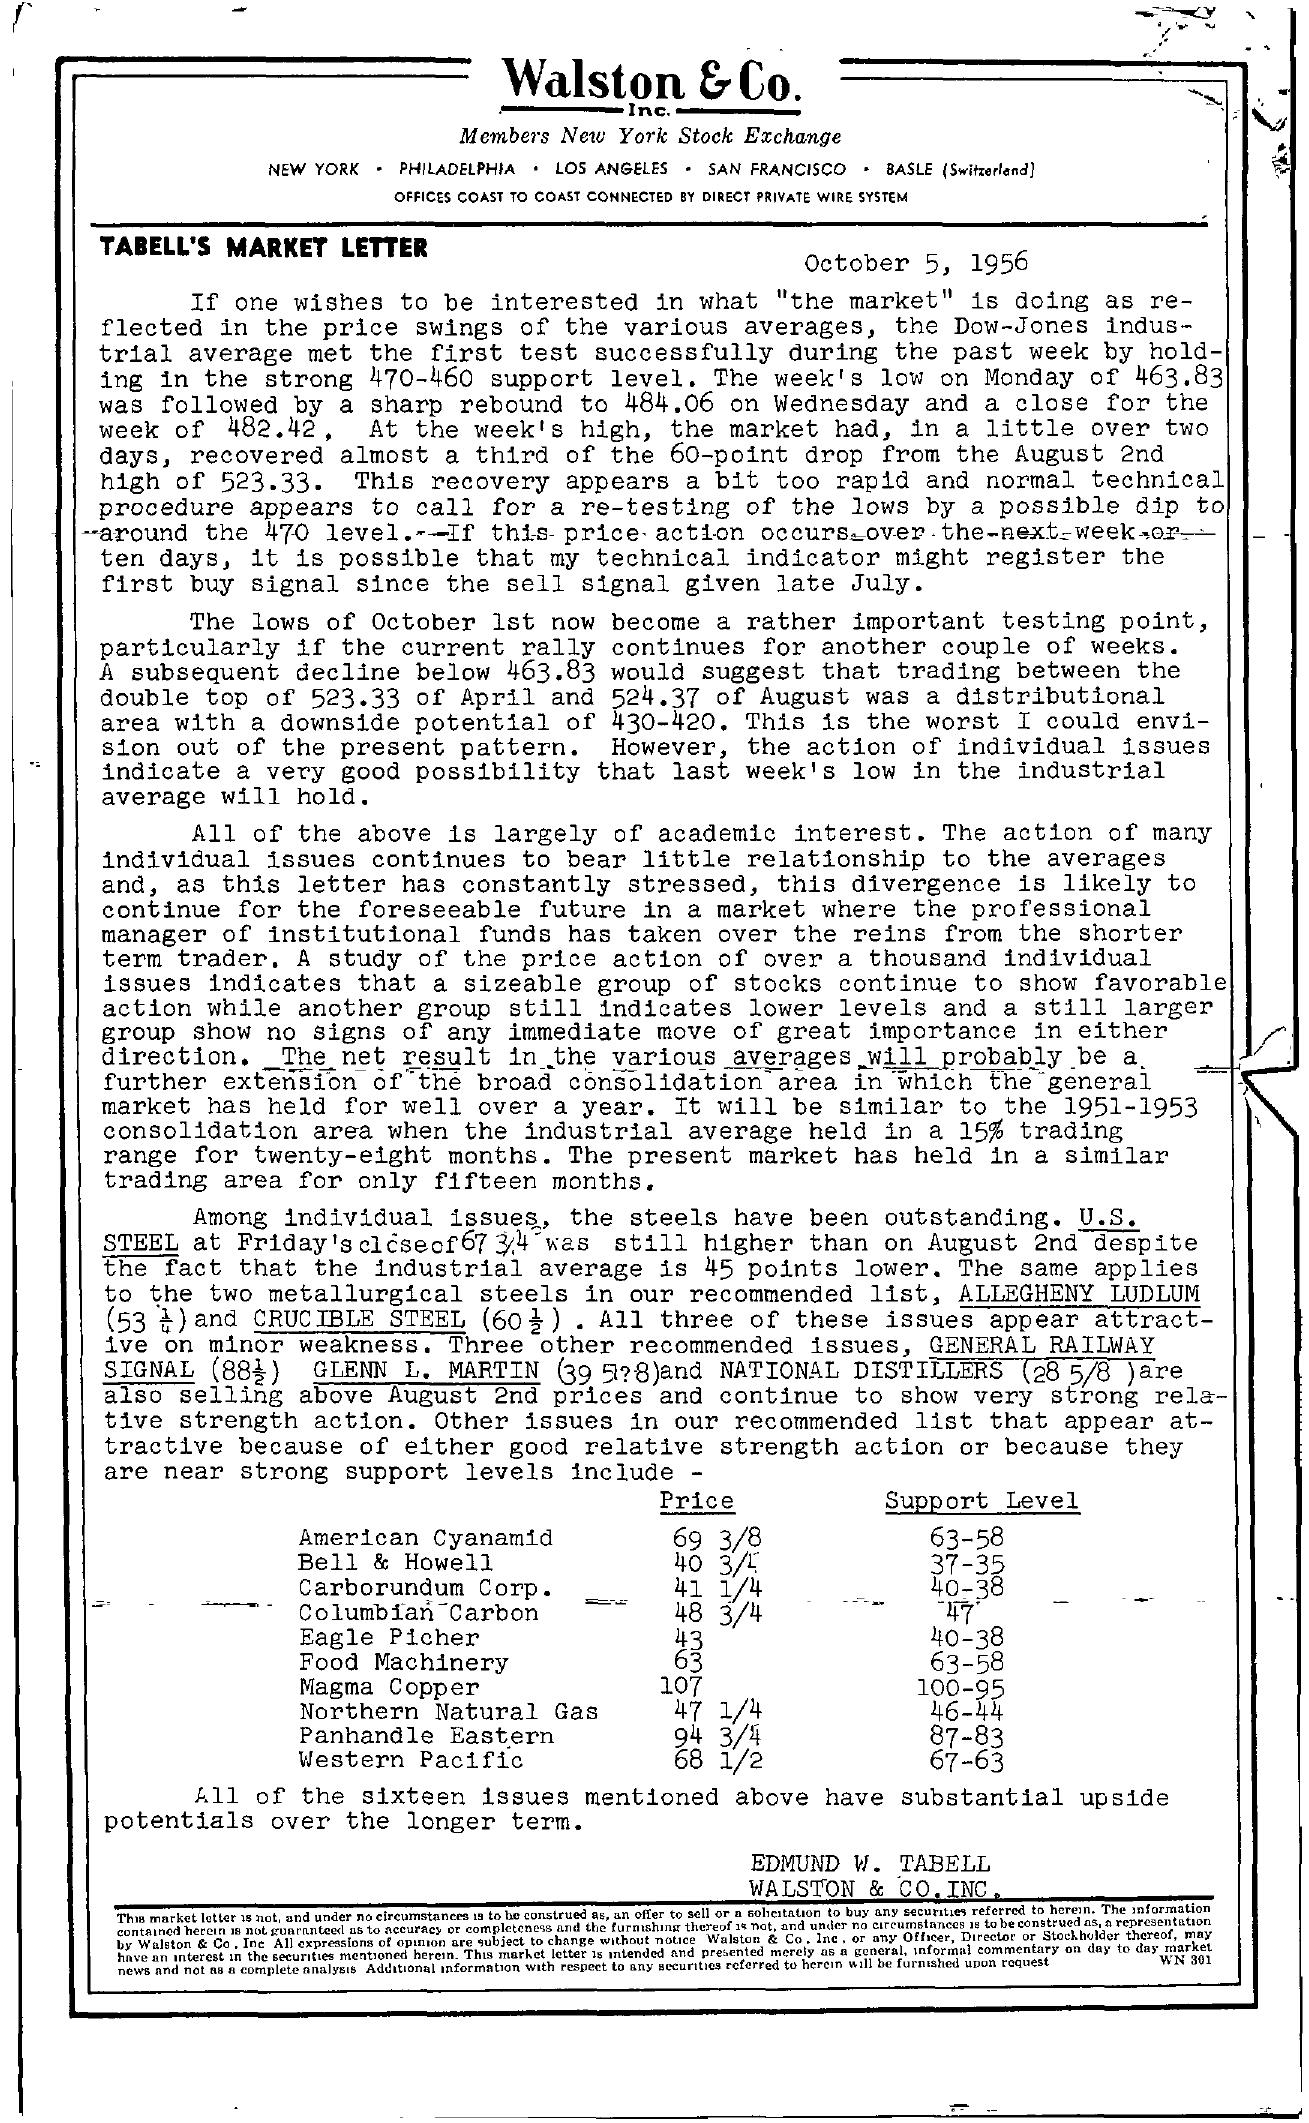 Tabell's Market Letter - October 05, 1956